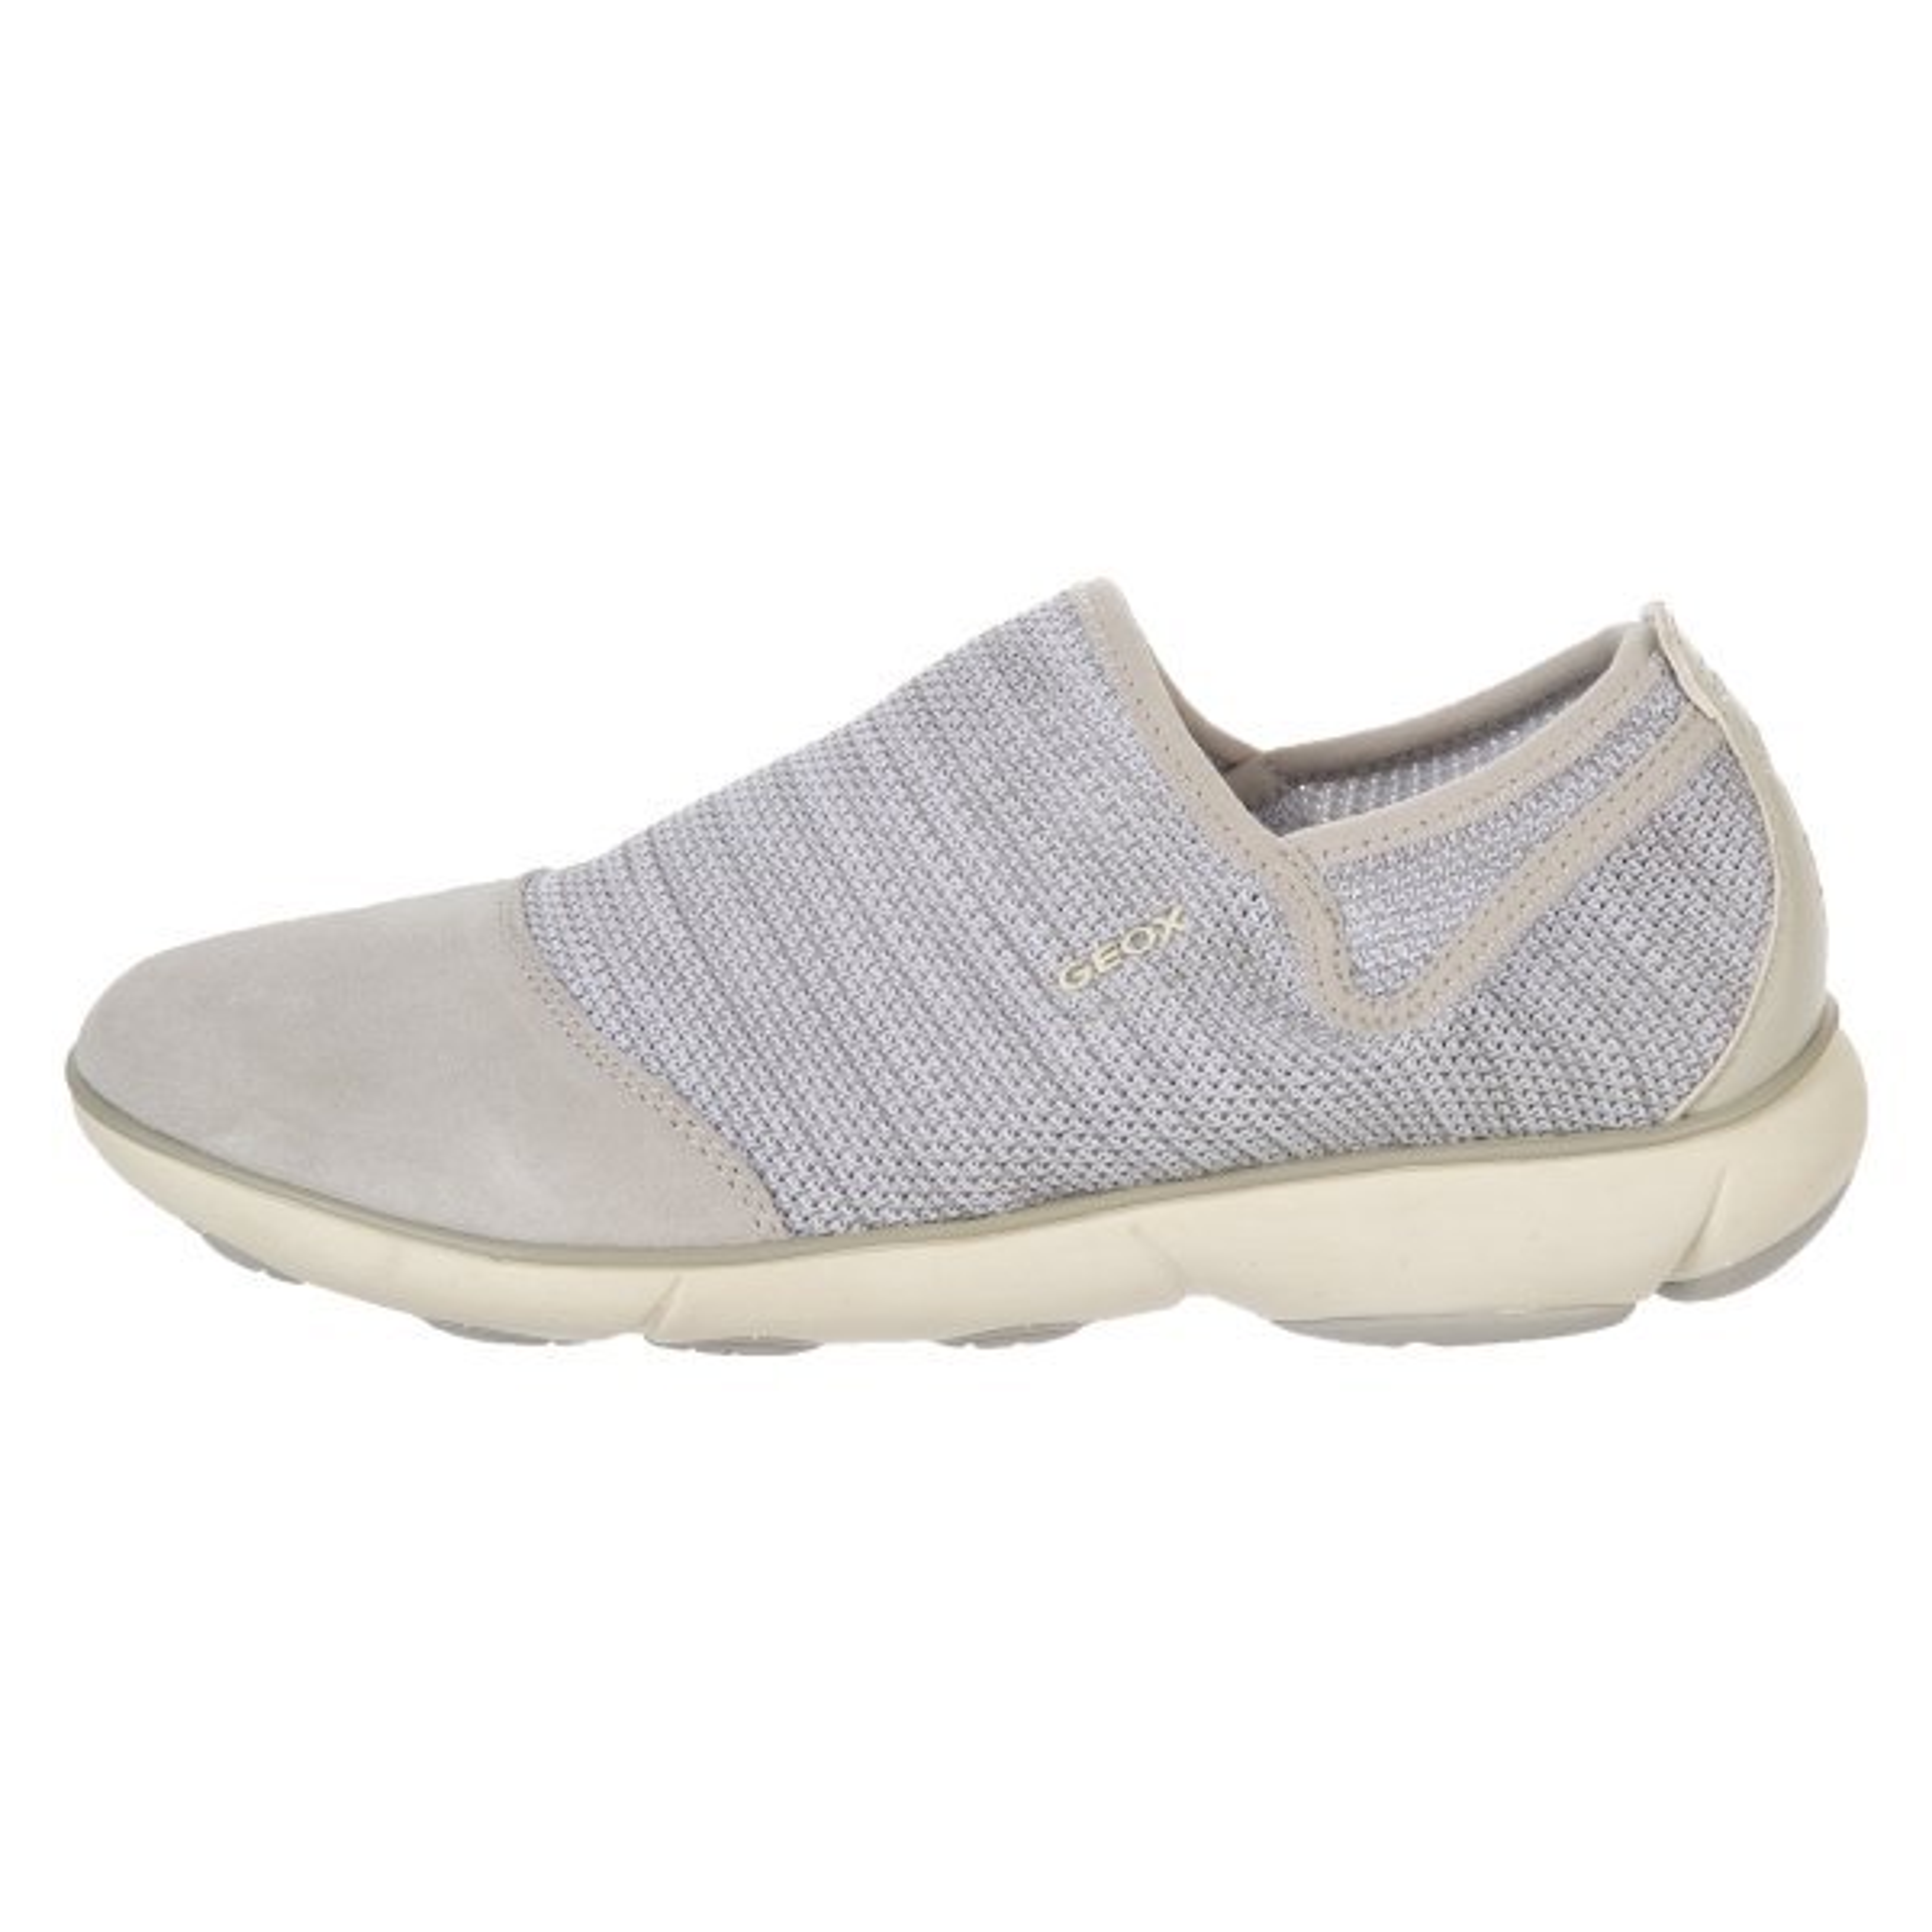 کفش روزمره زنانه جی اوکس مدل D821EB-06K22-C1002